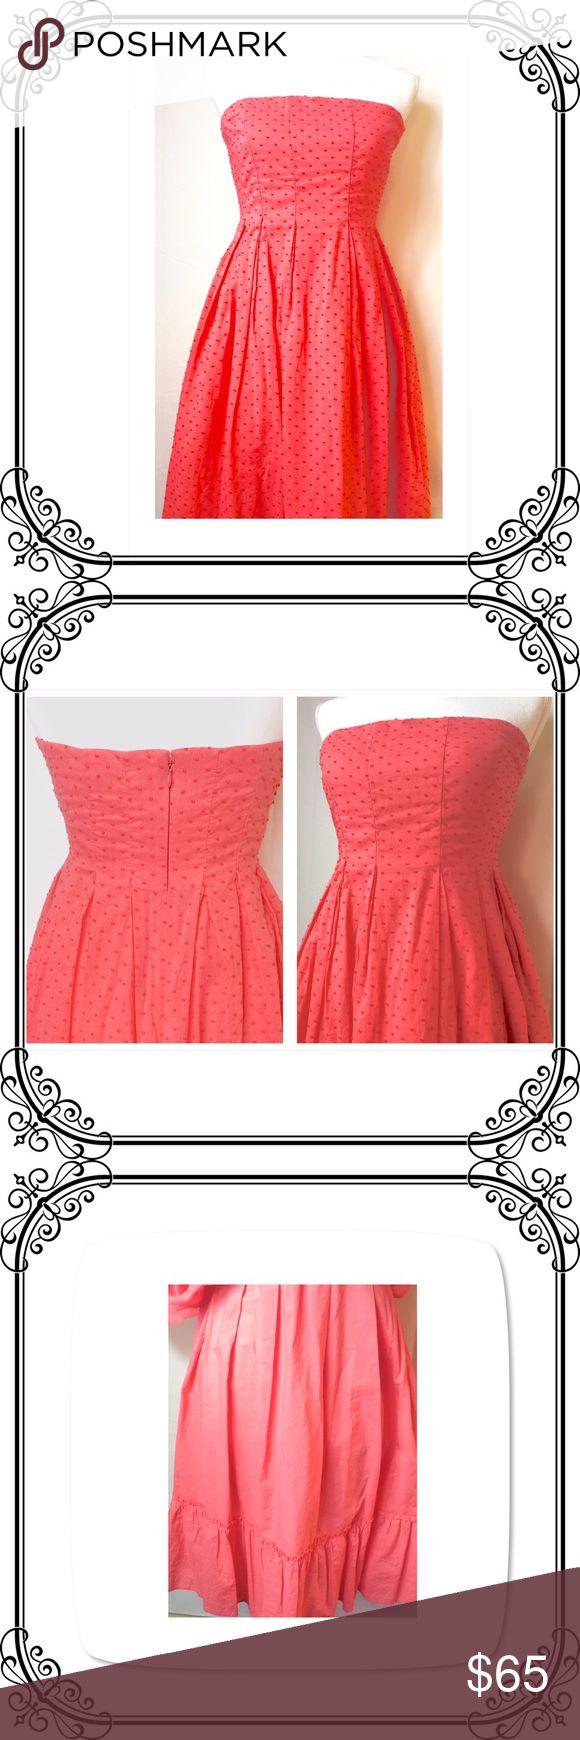 Best 25 salmon color dress ideas on pinterest cobalt pants j crew textured dress nvjuhfo Gallery